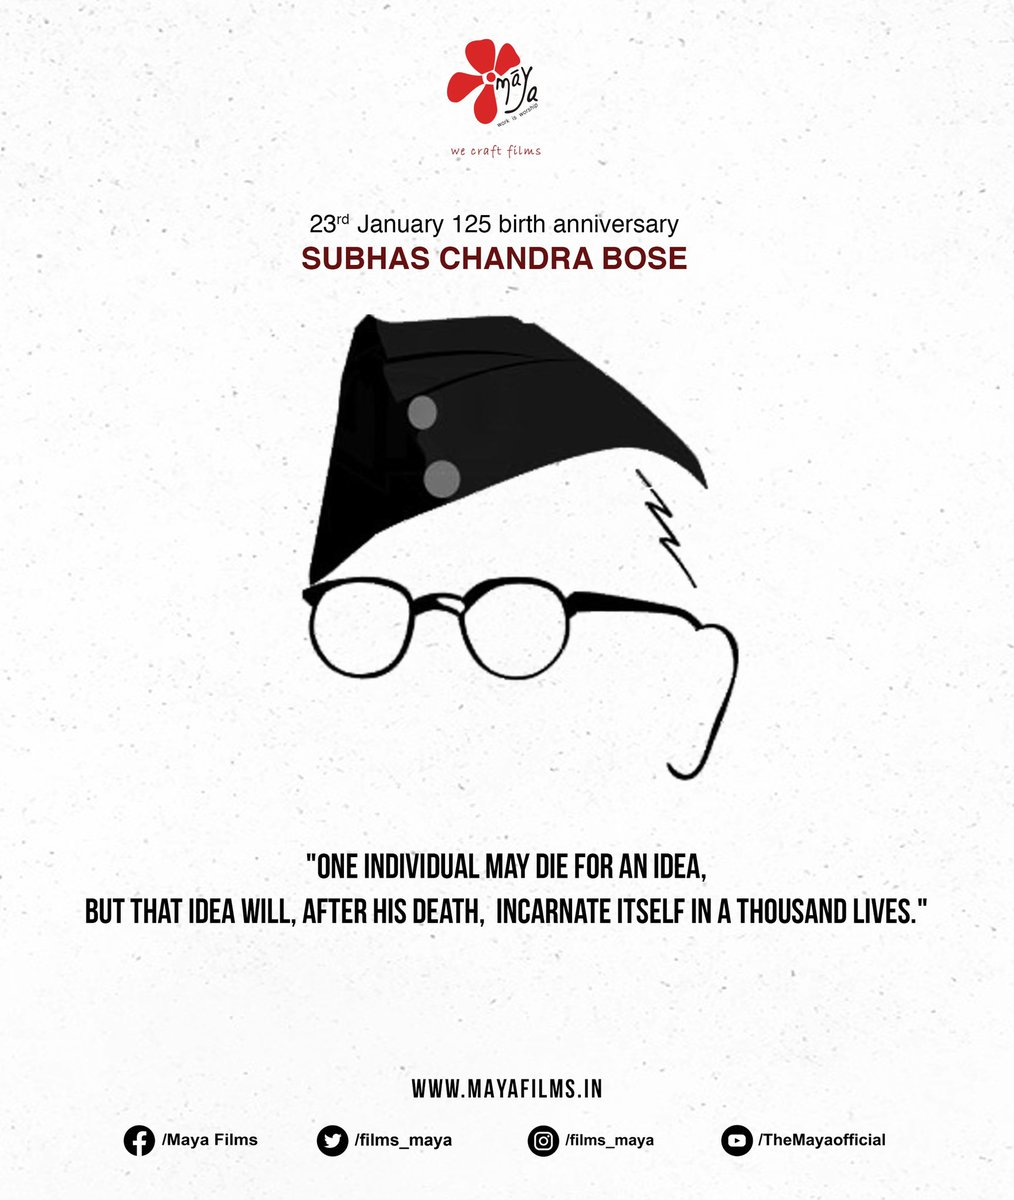 Remembering Netaji Subhas Chandra Bose on his birth anniversary. The struggle,Sacrifice and dedication of Netaji is an inspiration to all of us. Jai Hind !!  #mayafilms #films #series #netaji #subhashchandrabose #production #youtube #socailmedia #workisworship #creativity